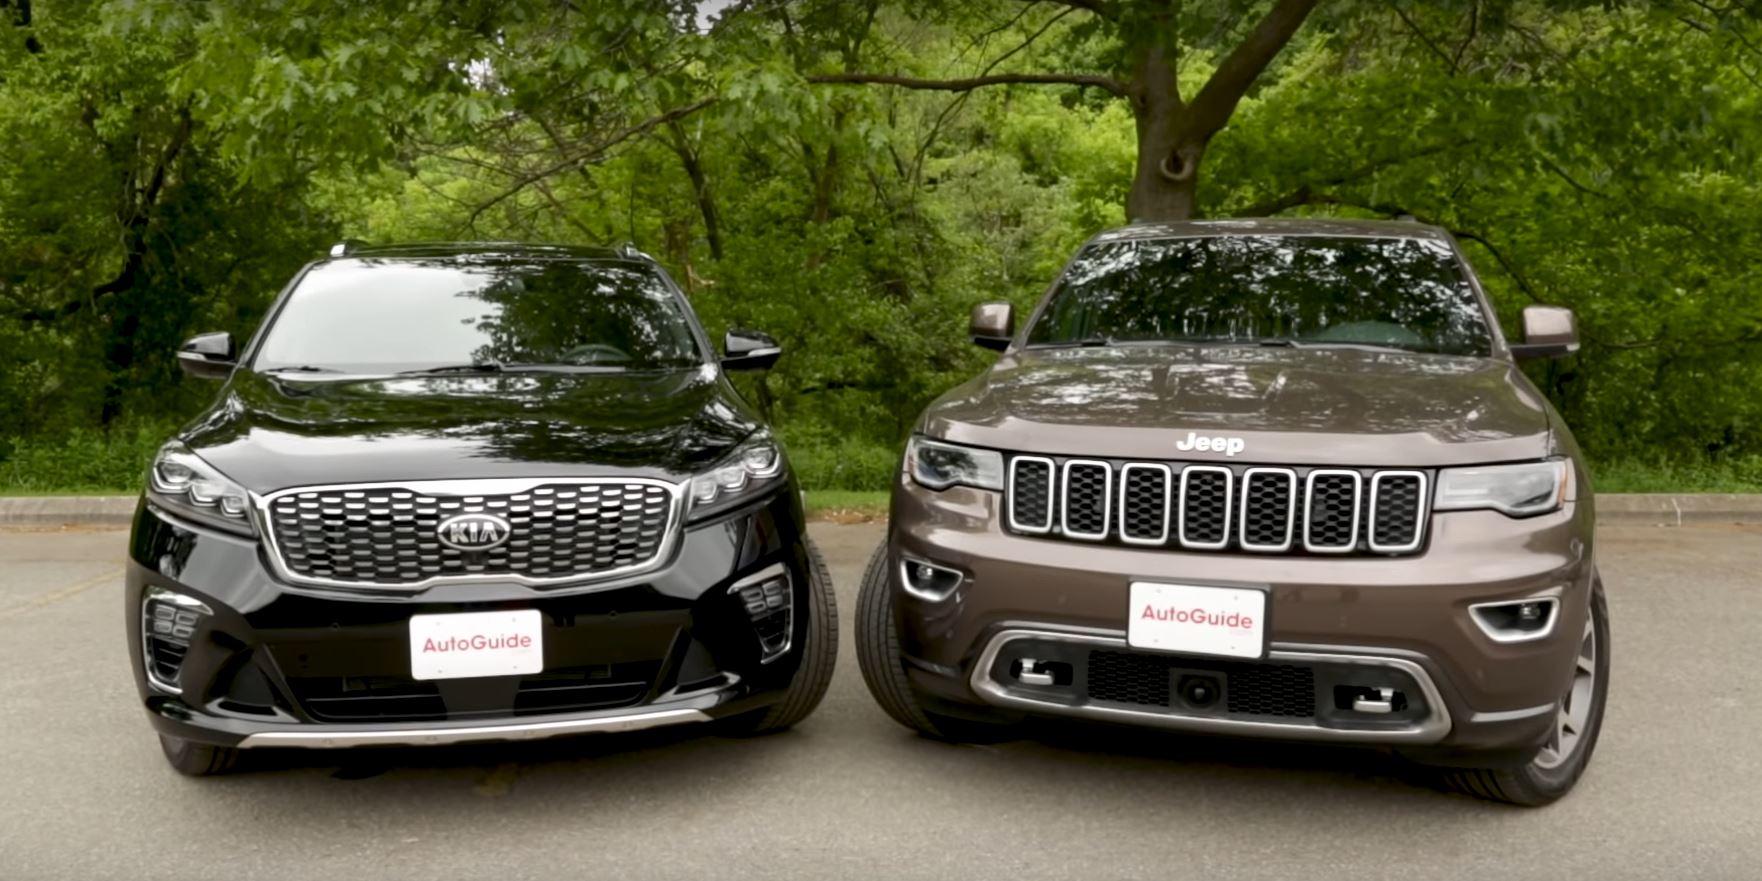 Sorento Vs Grand Cherokee - Chevy Equinox Vs Ford Explorer ...